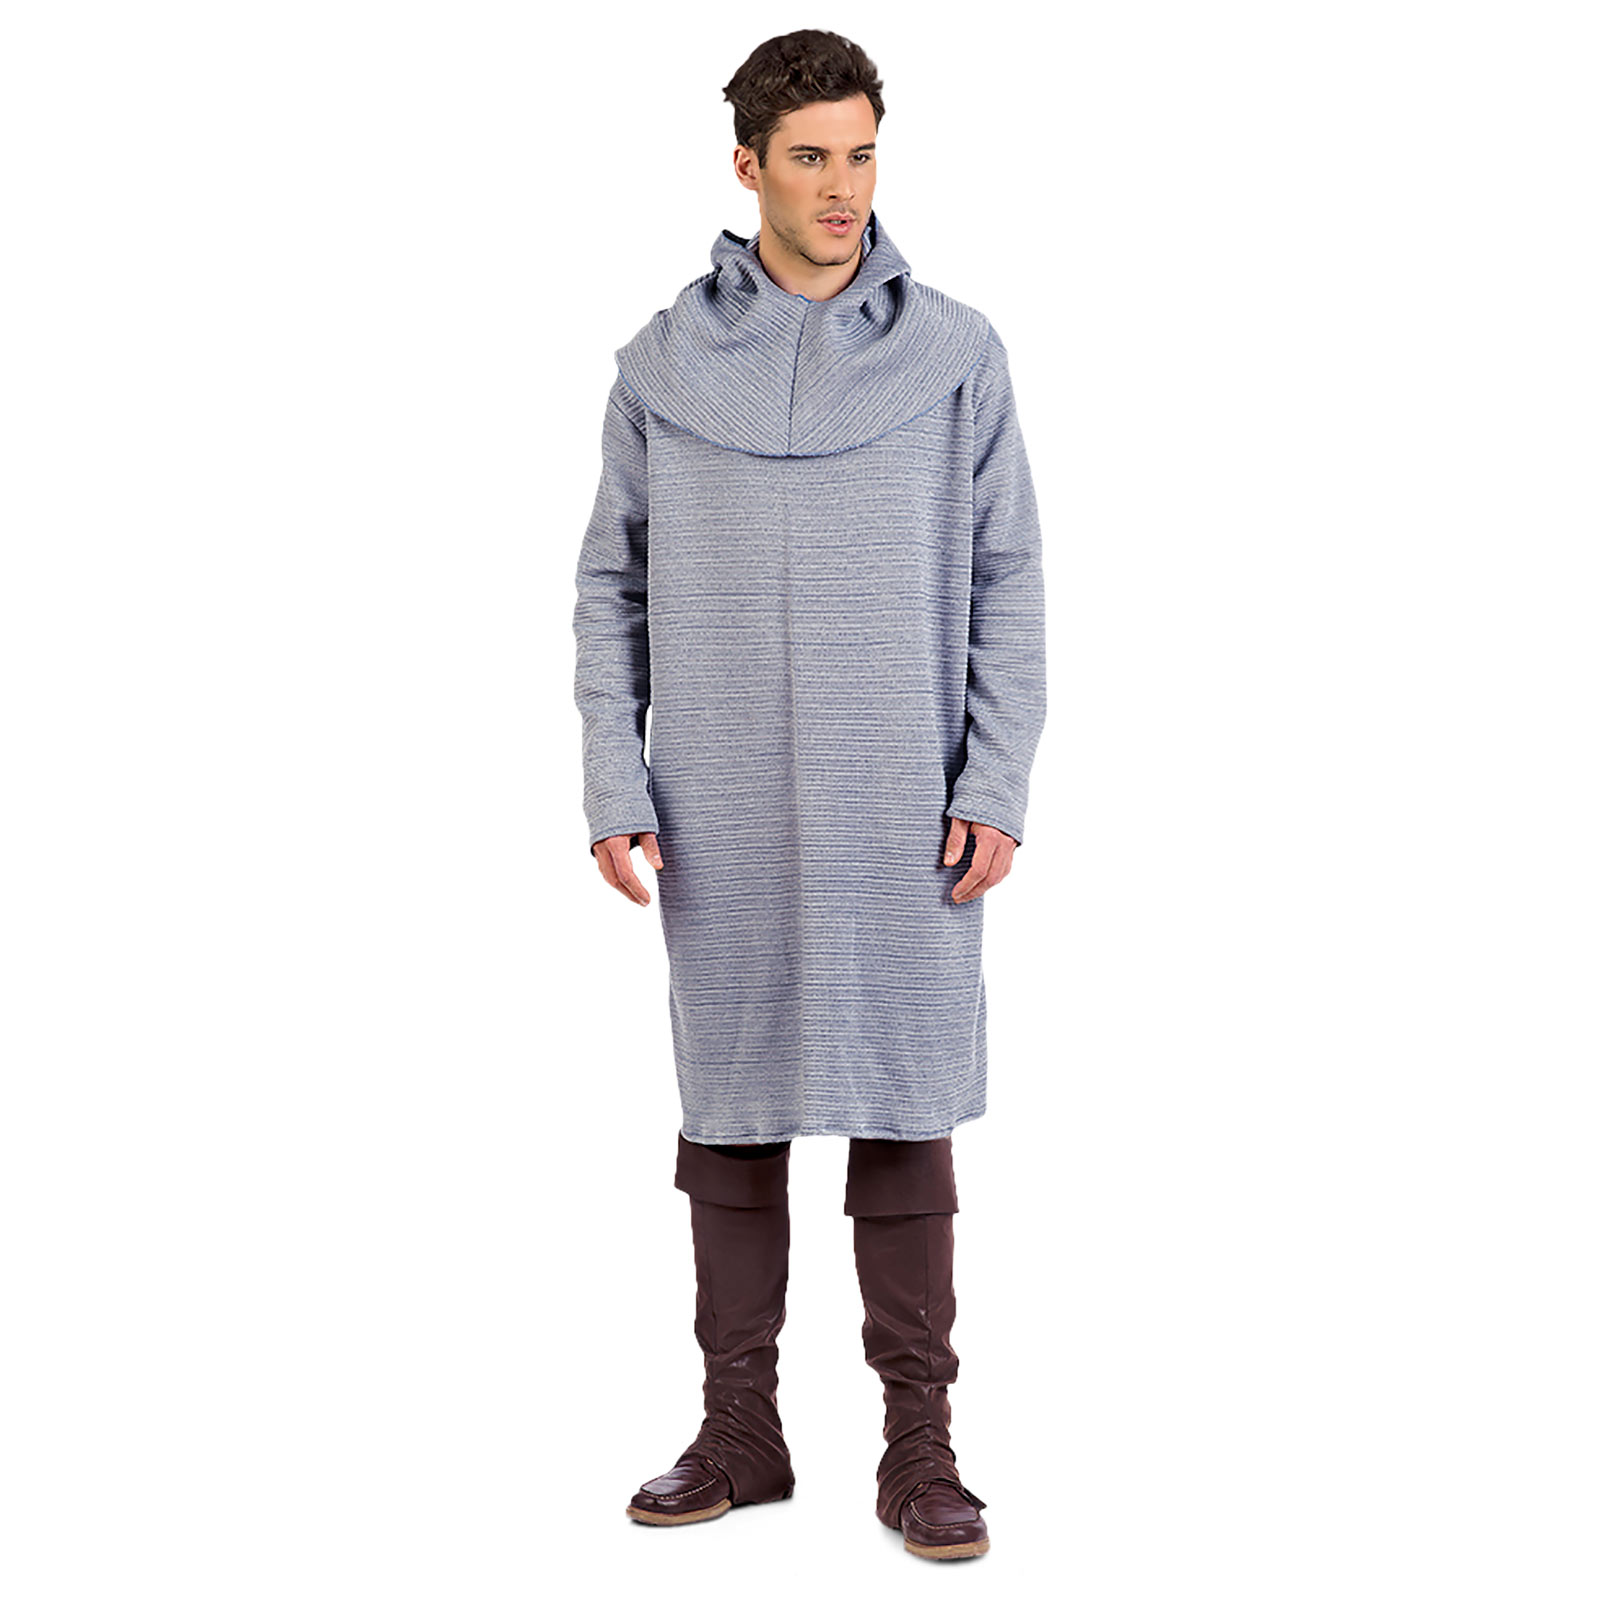 Mittelalter Kettenhemd Tunika Herren